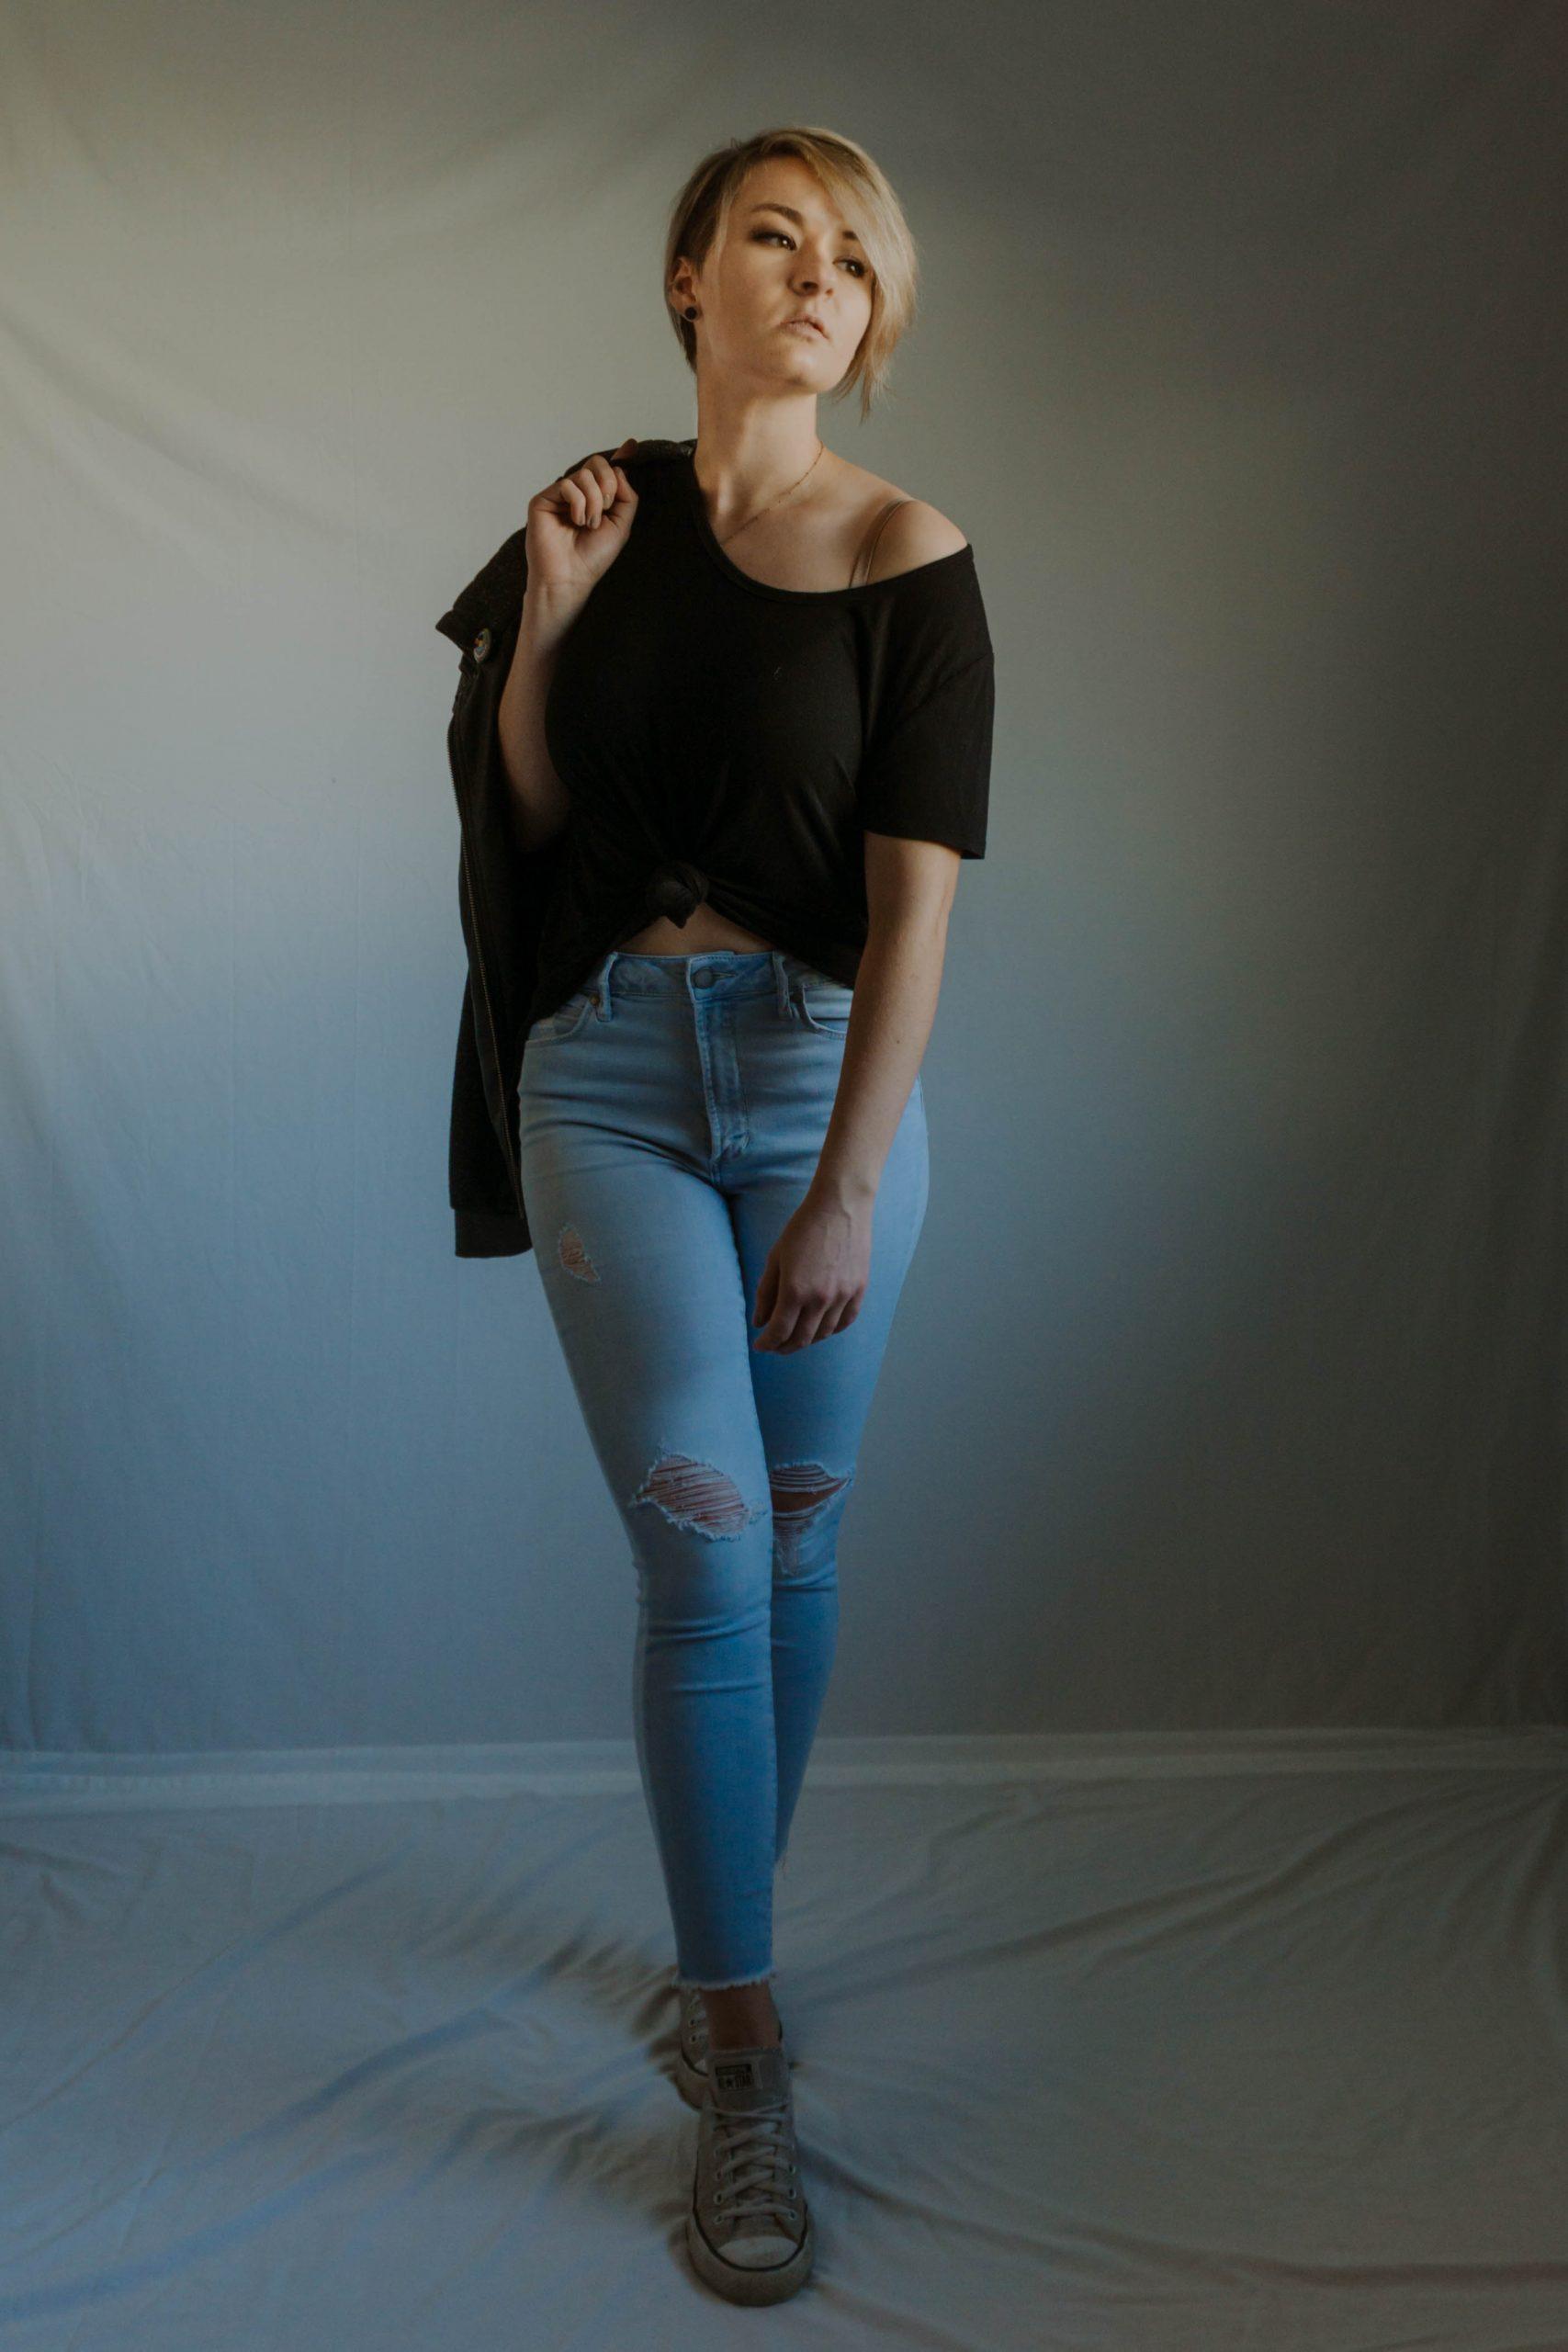 24 - Age